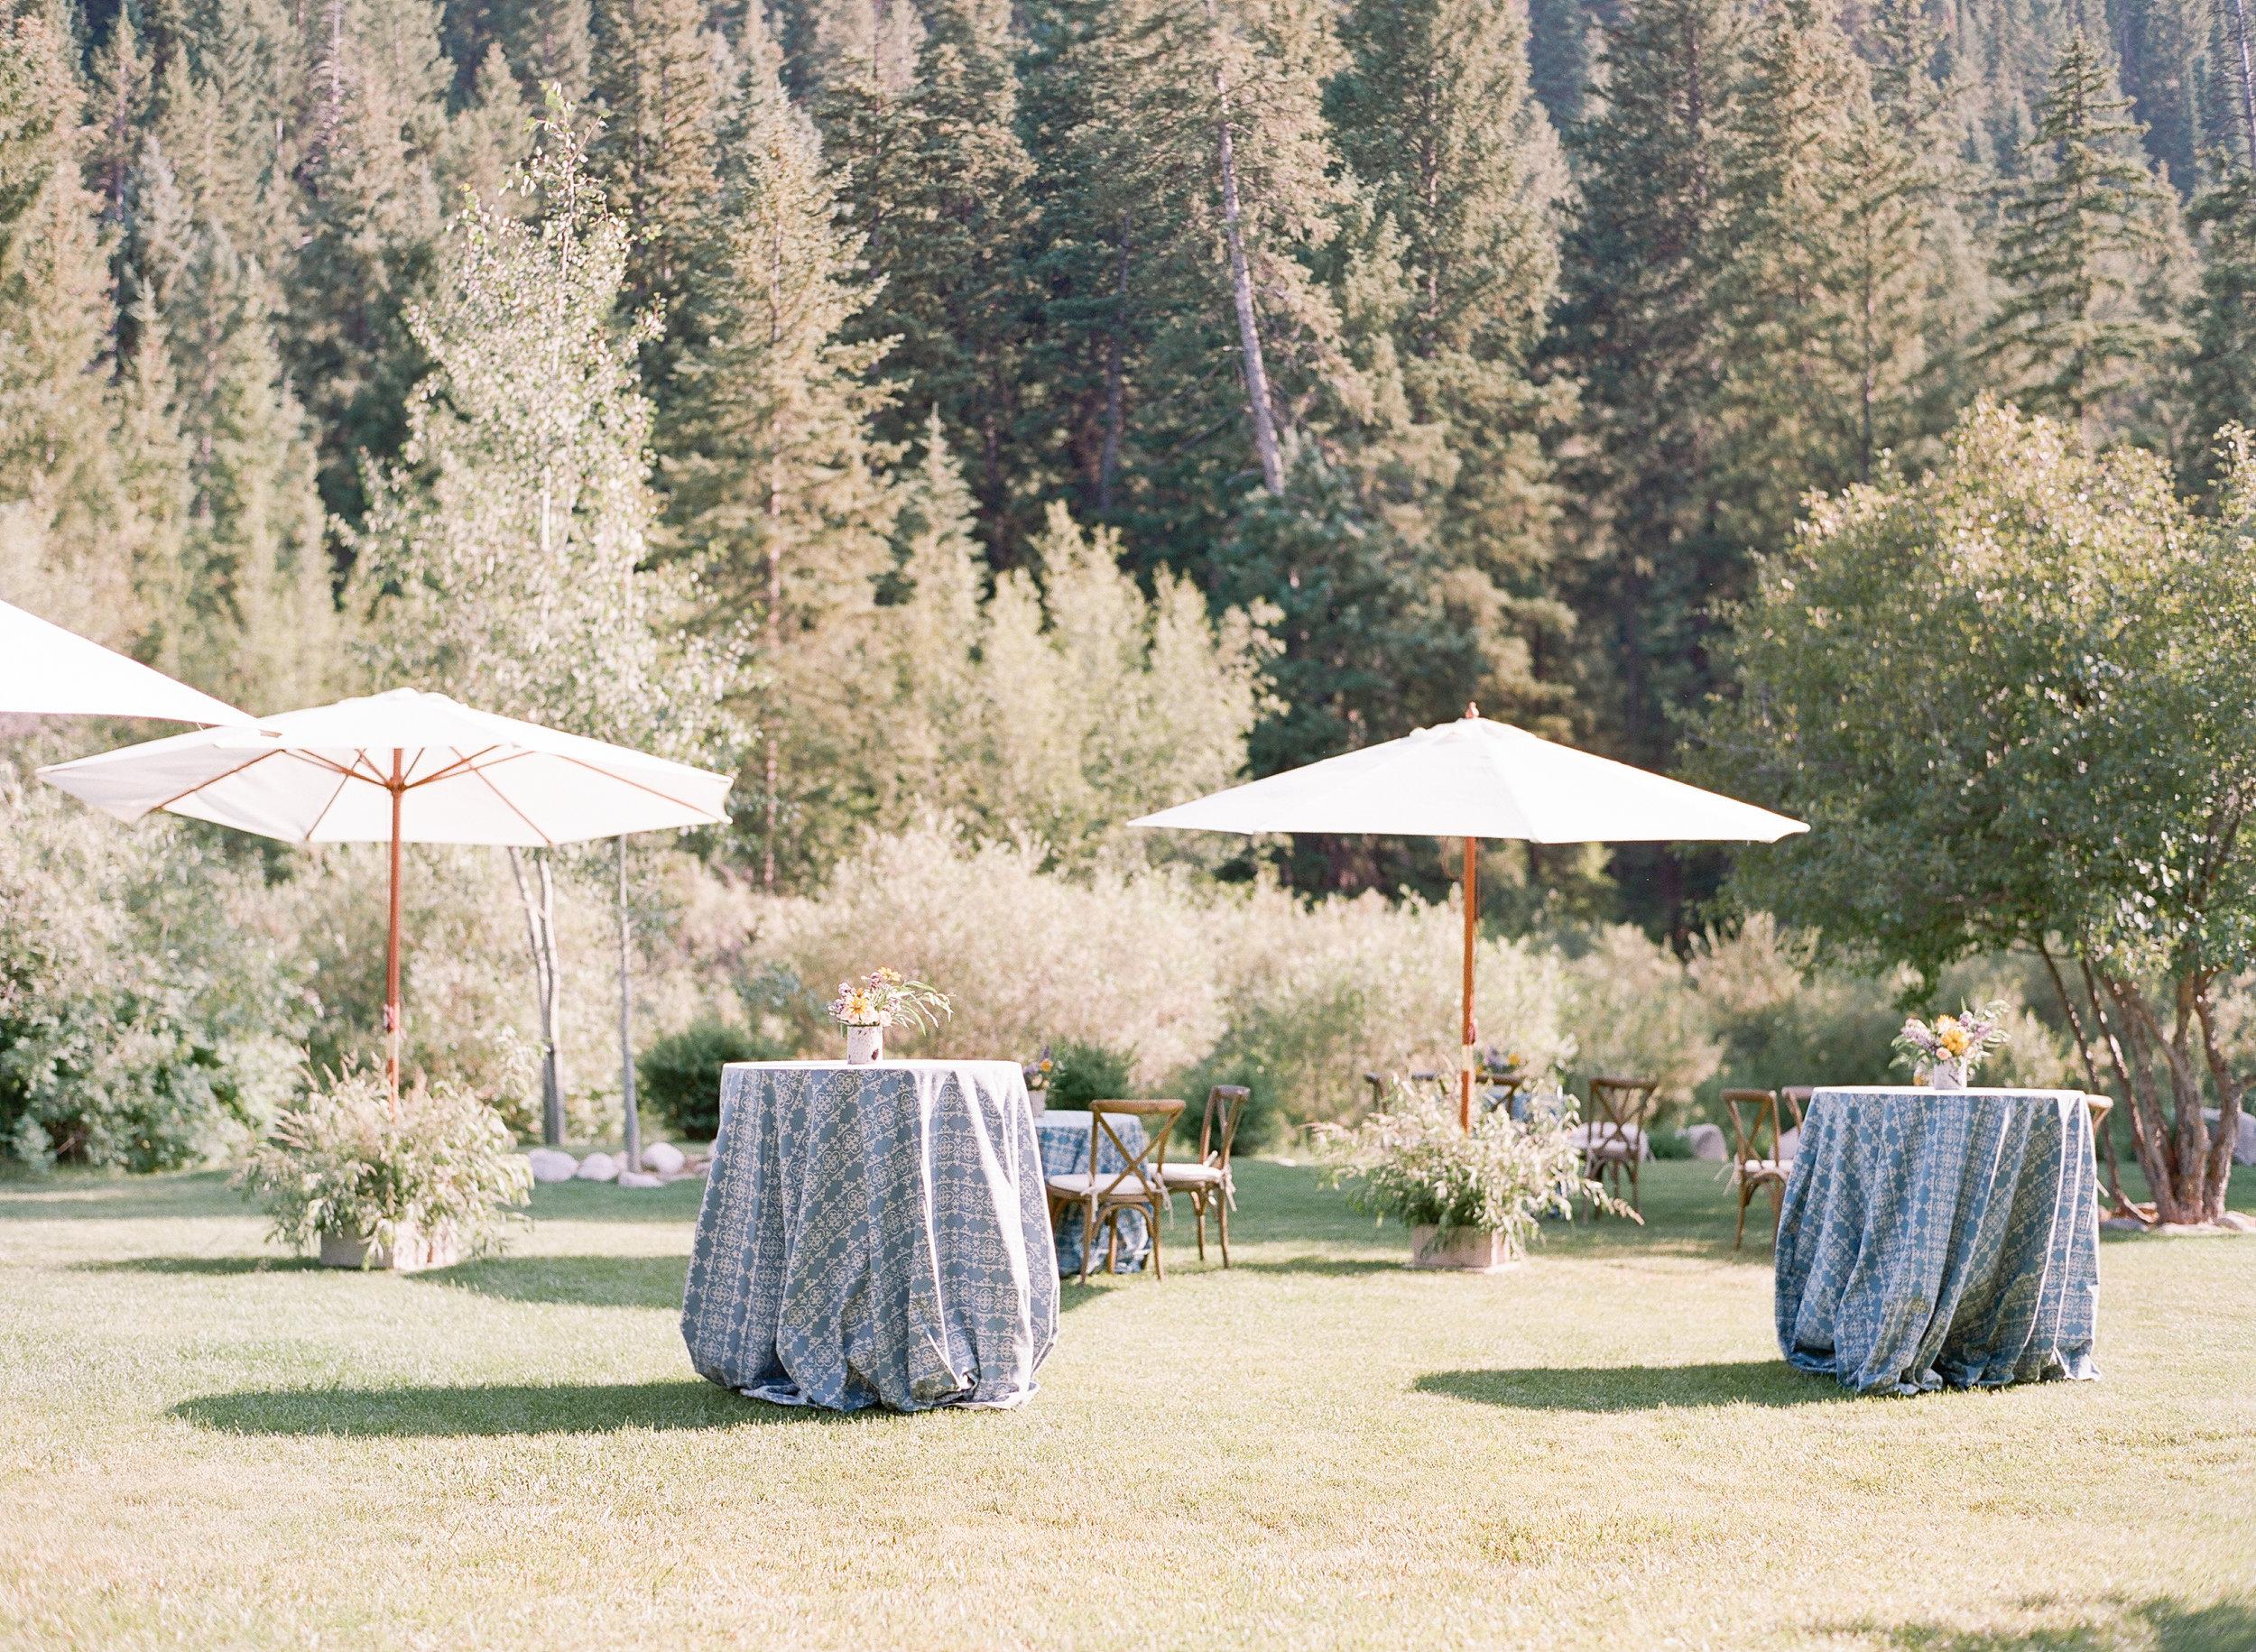 Cocktail reception decor, sunny wedding, Equestrian bride, equine bridal photography, country wedding, wildhorse and bride, Sylvie Gil Photography